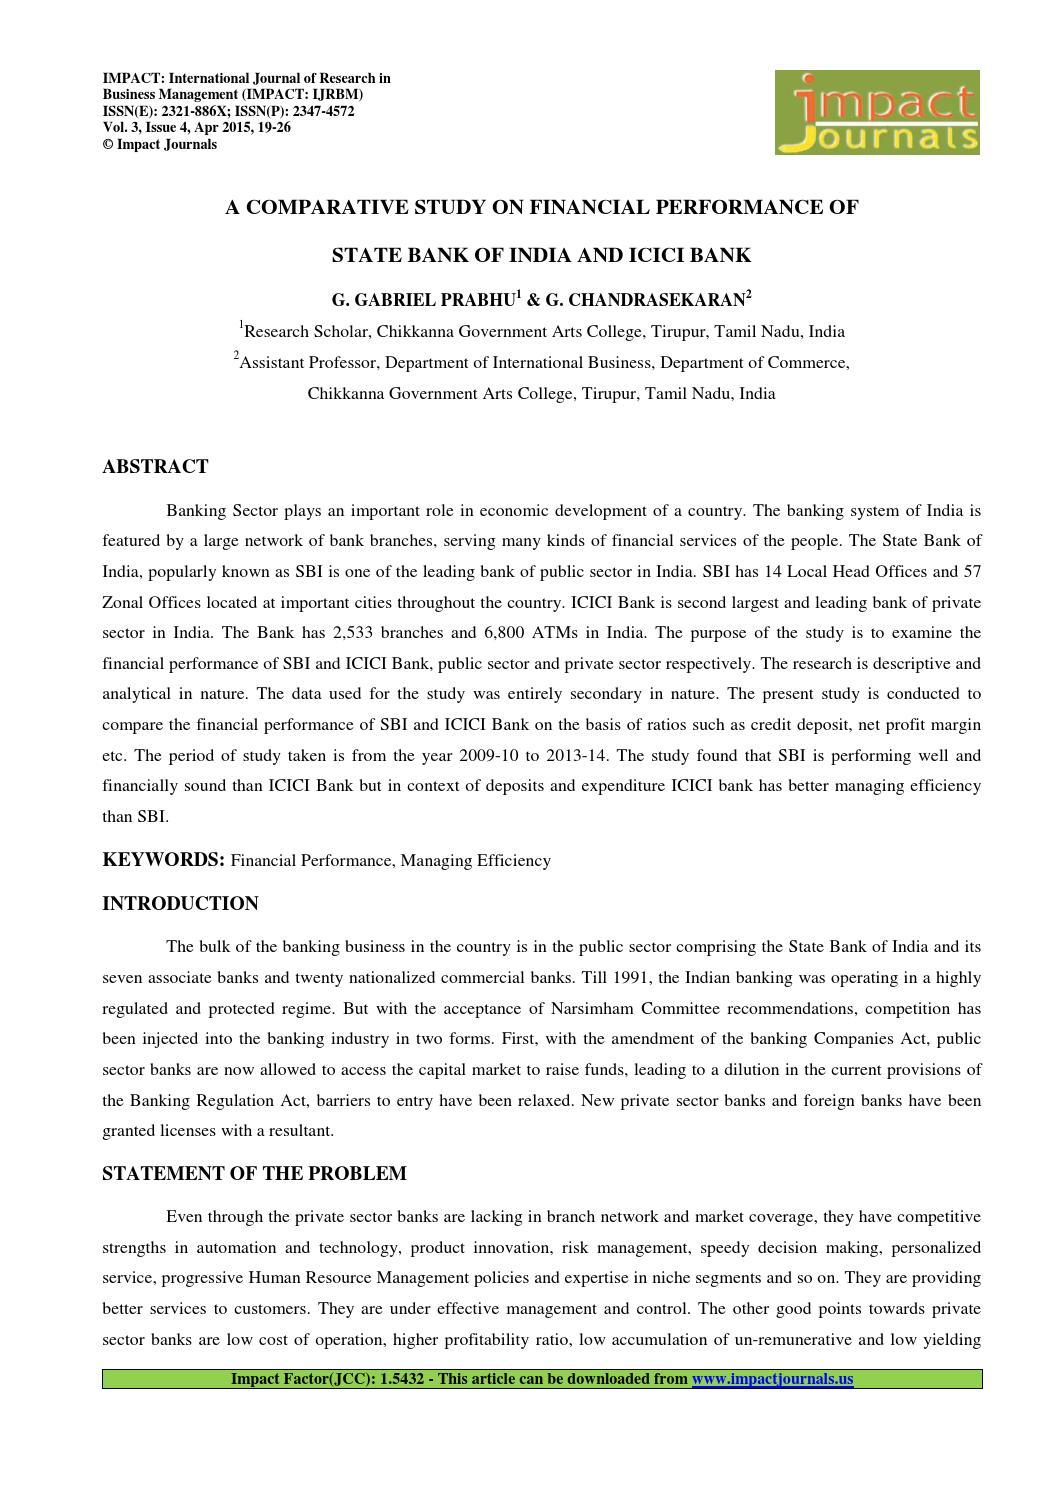 4 manage a comparative study on the financial g gabriel prabhu